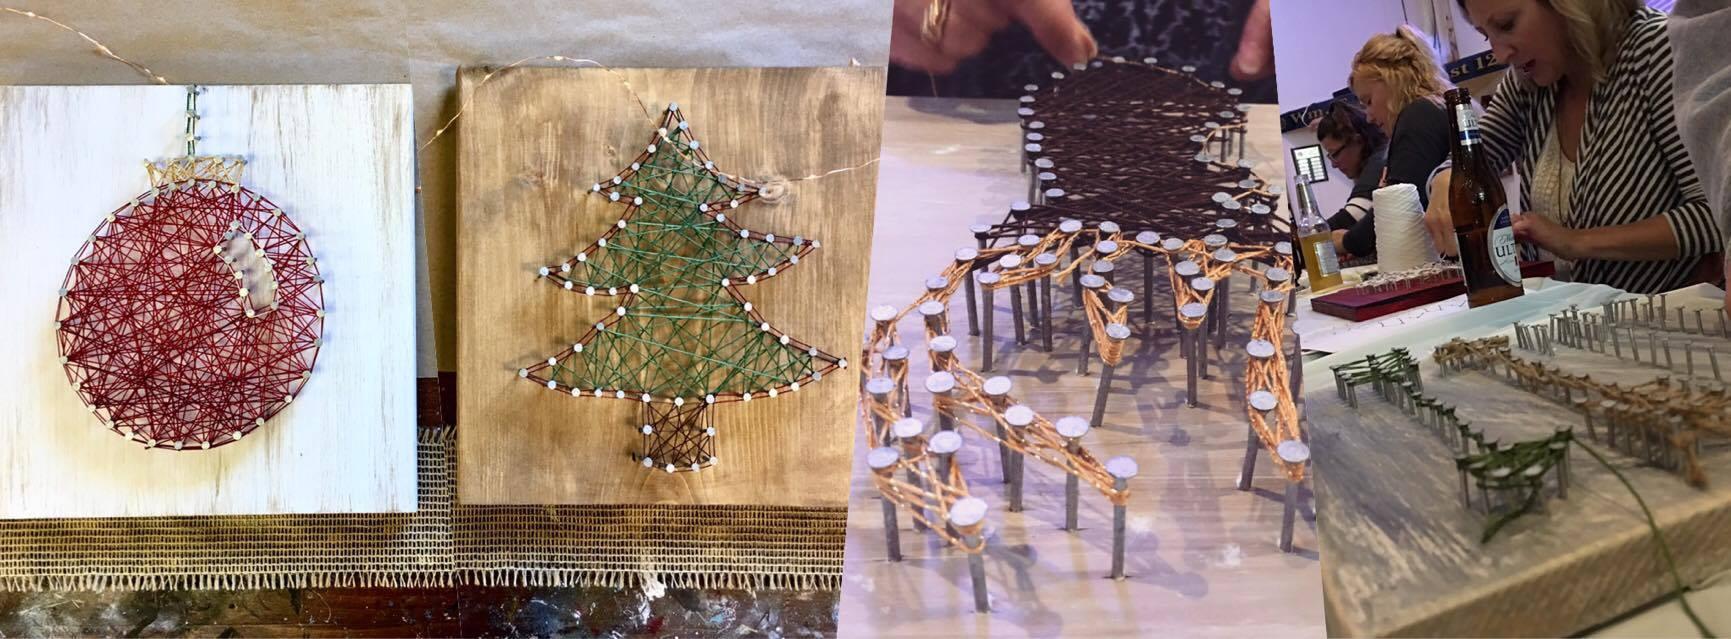 String Art - Holiday Themes